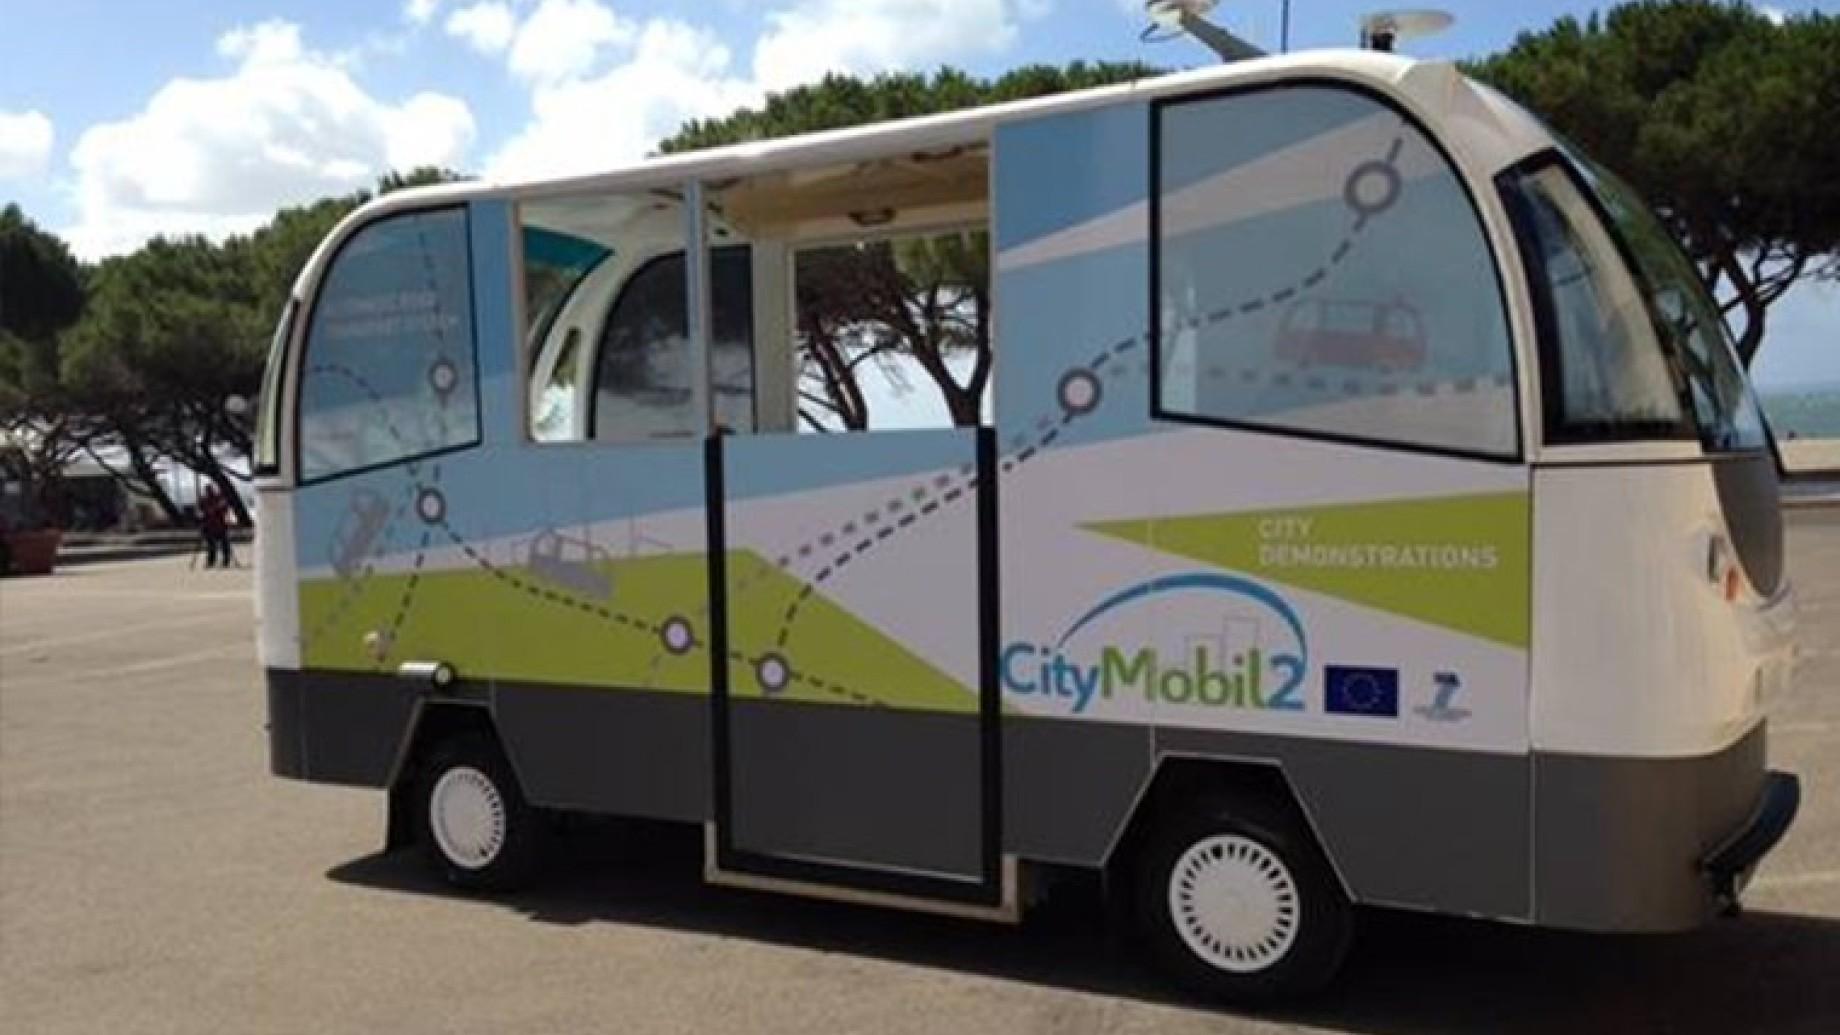 bus-senza-autista-city-mobil